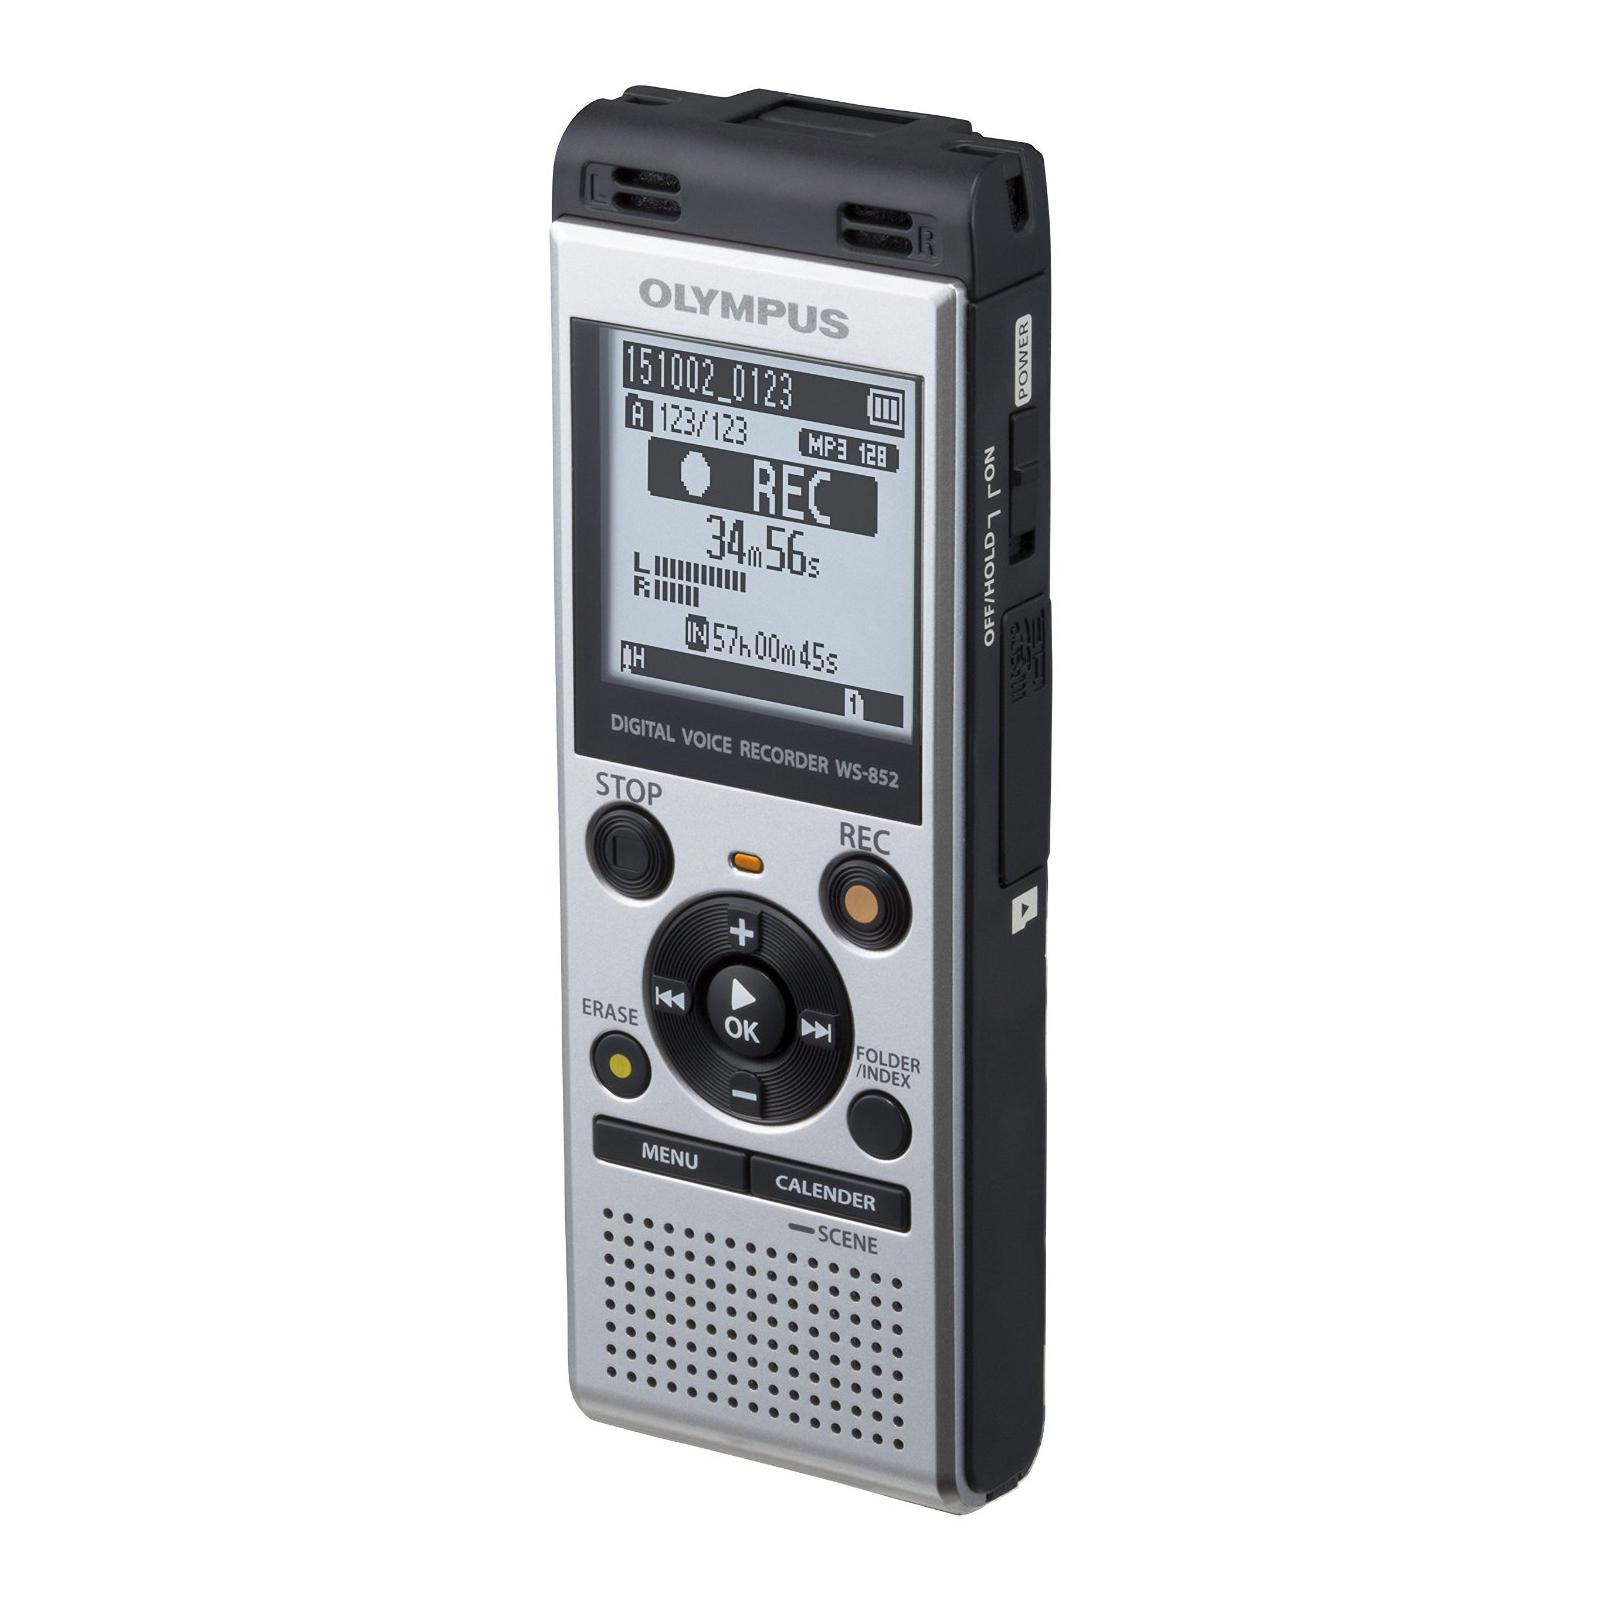 Цифровой диктофон OLYMPUS WS-852 4GB Silver (V415121SE000) изображение 4